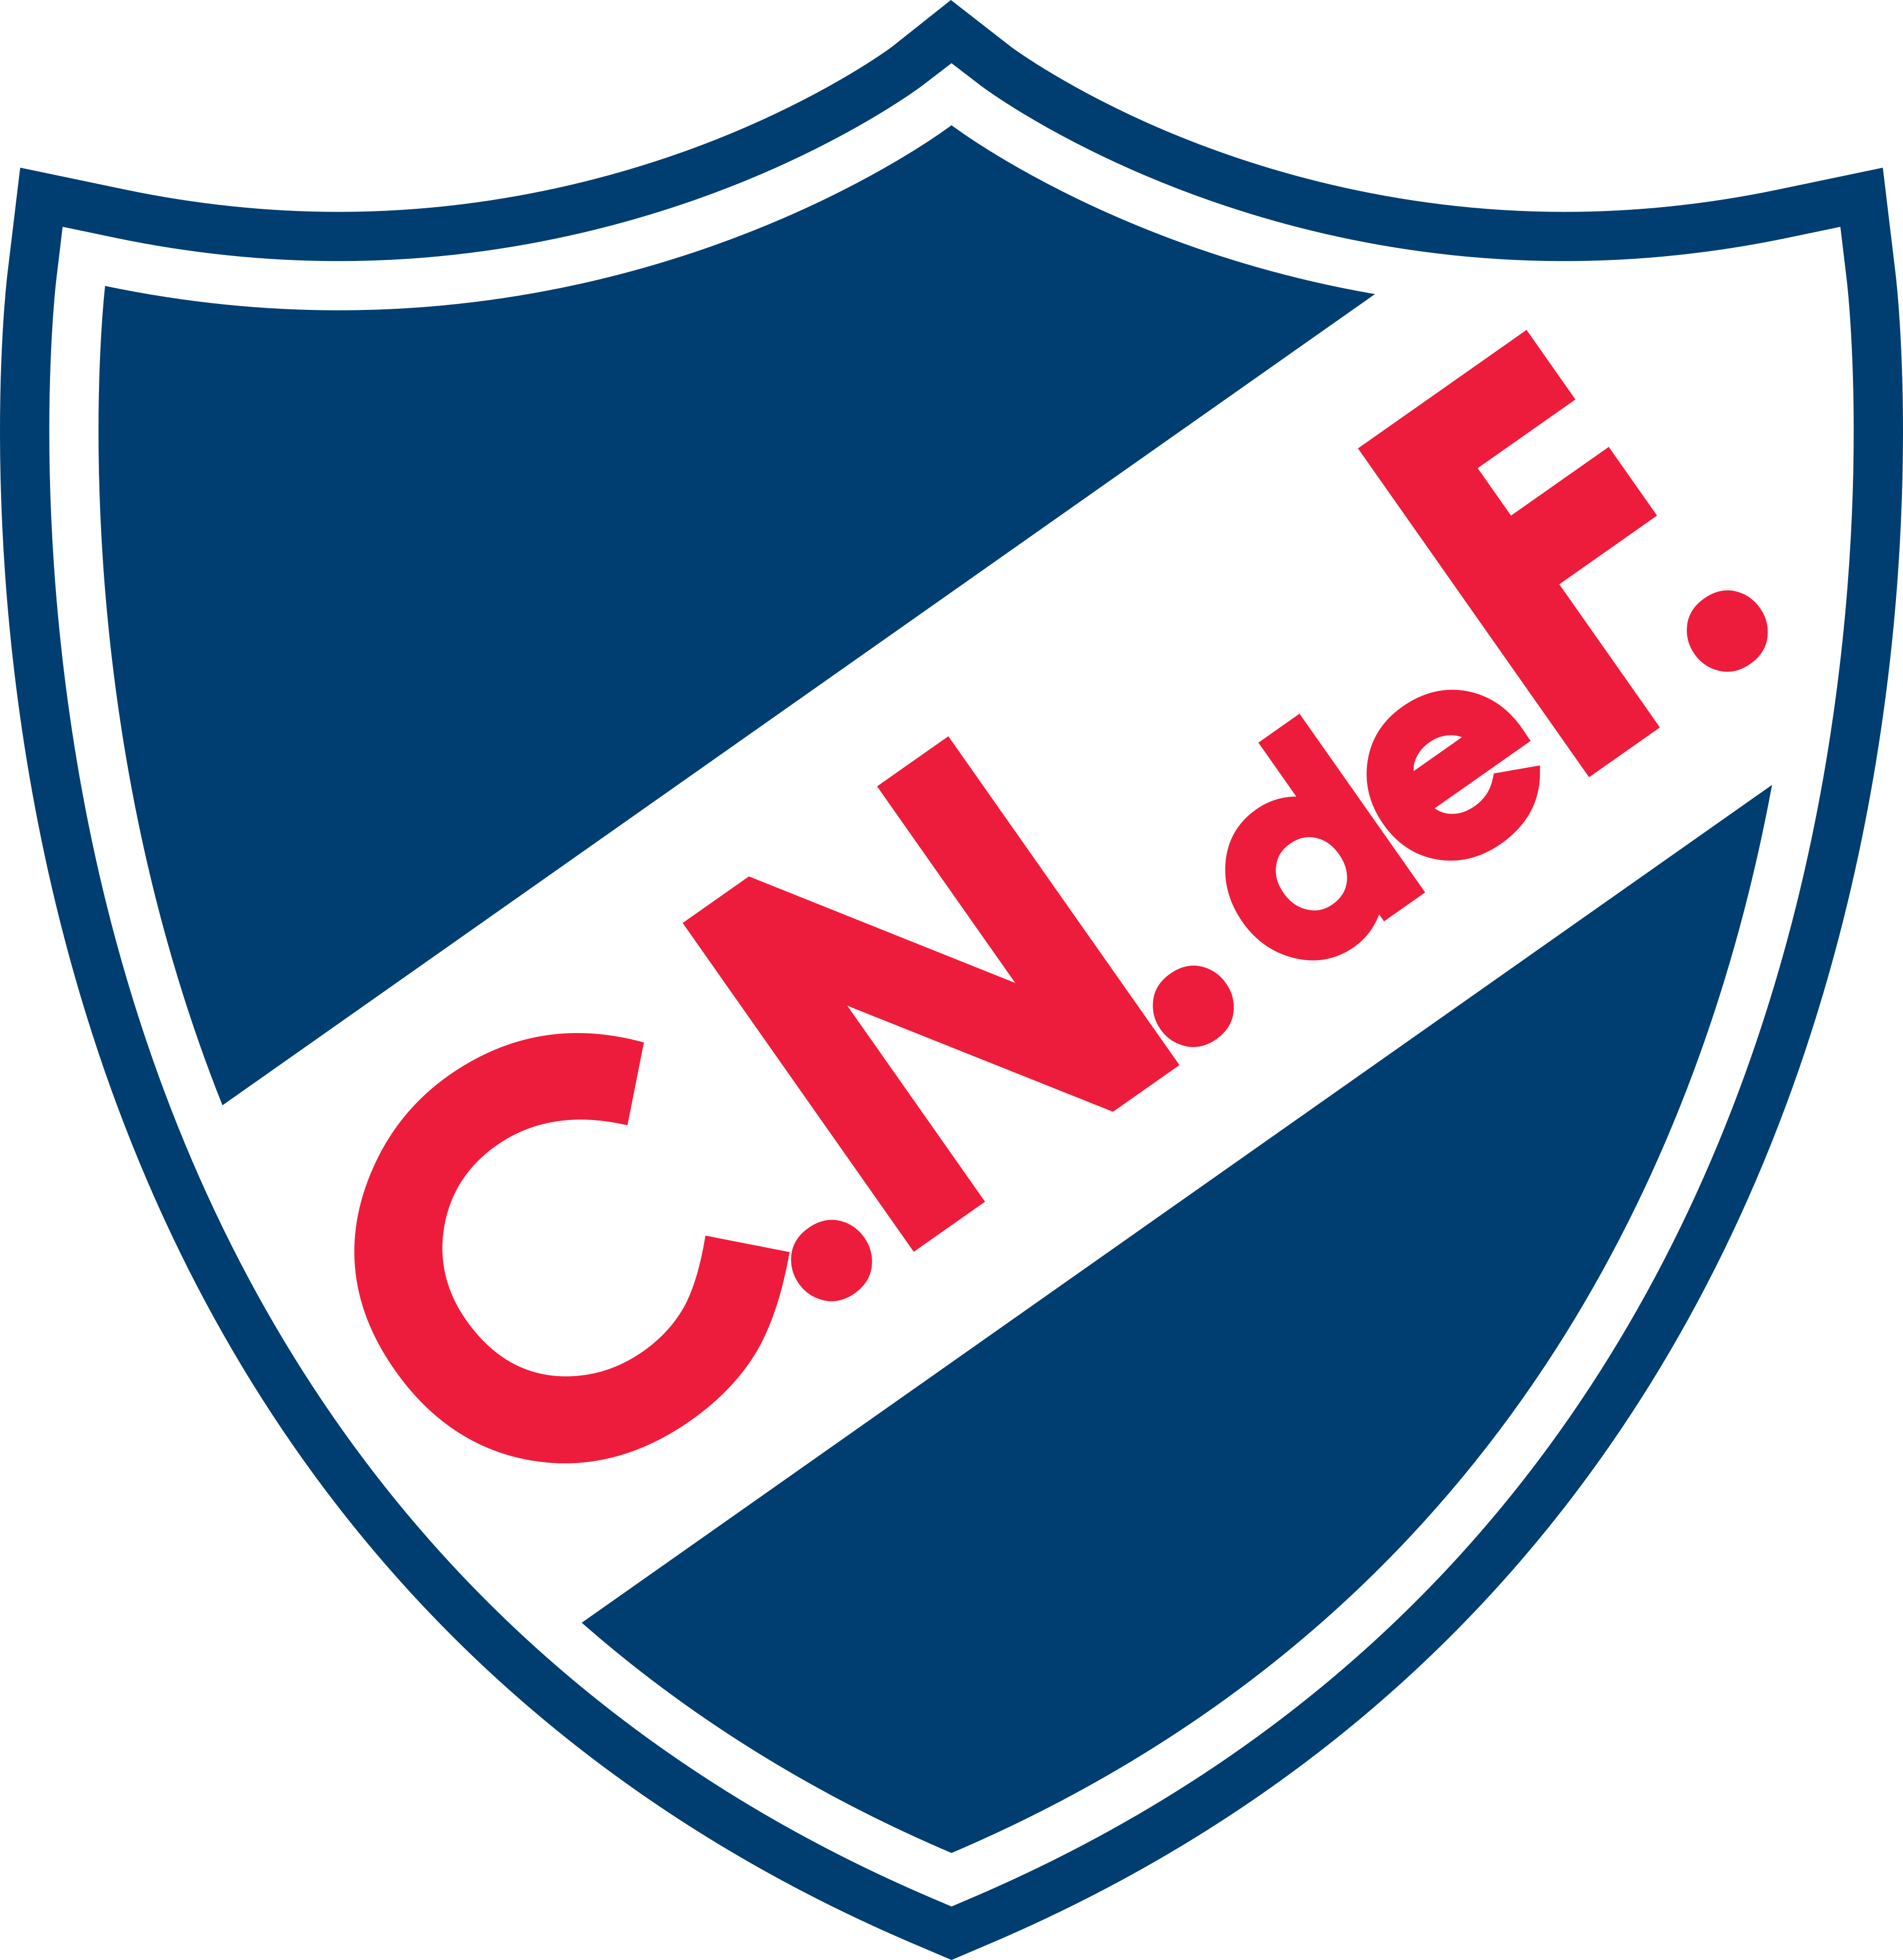 nacional do uruguai logo escudo - Nacional Logo (Uruguay) – Club Nacional de Football Escudo